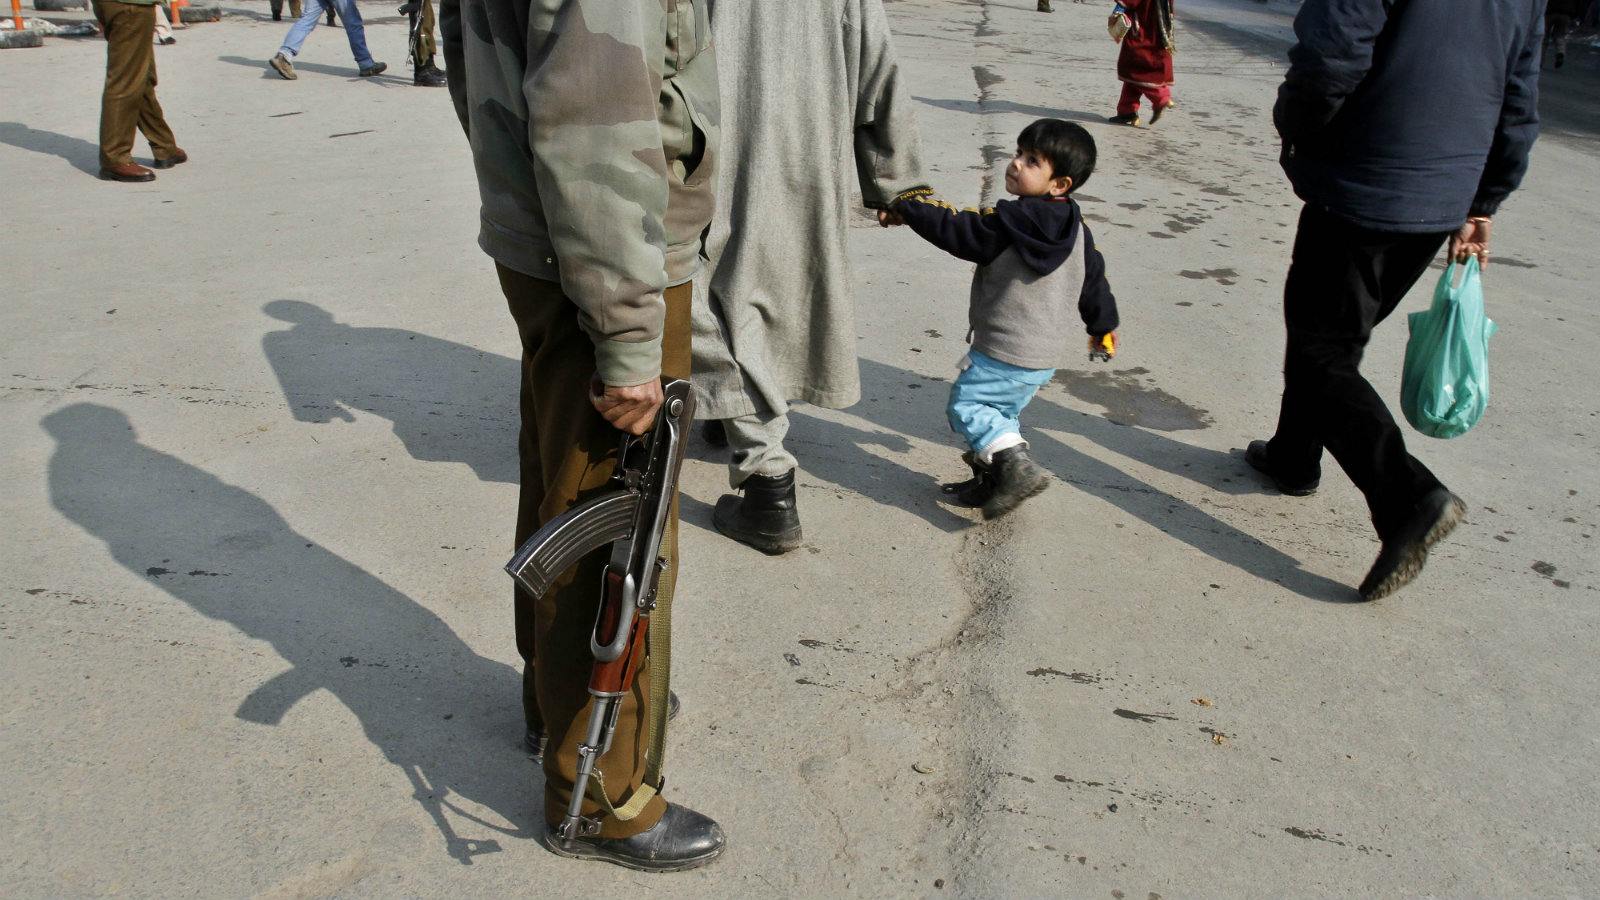 A Kashmiri boy passes by an Indian paramilitary soldier in Srinagar.